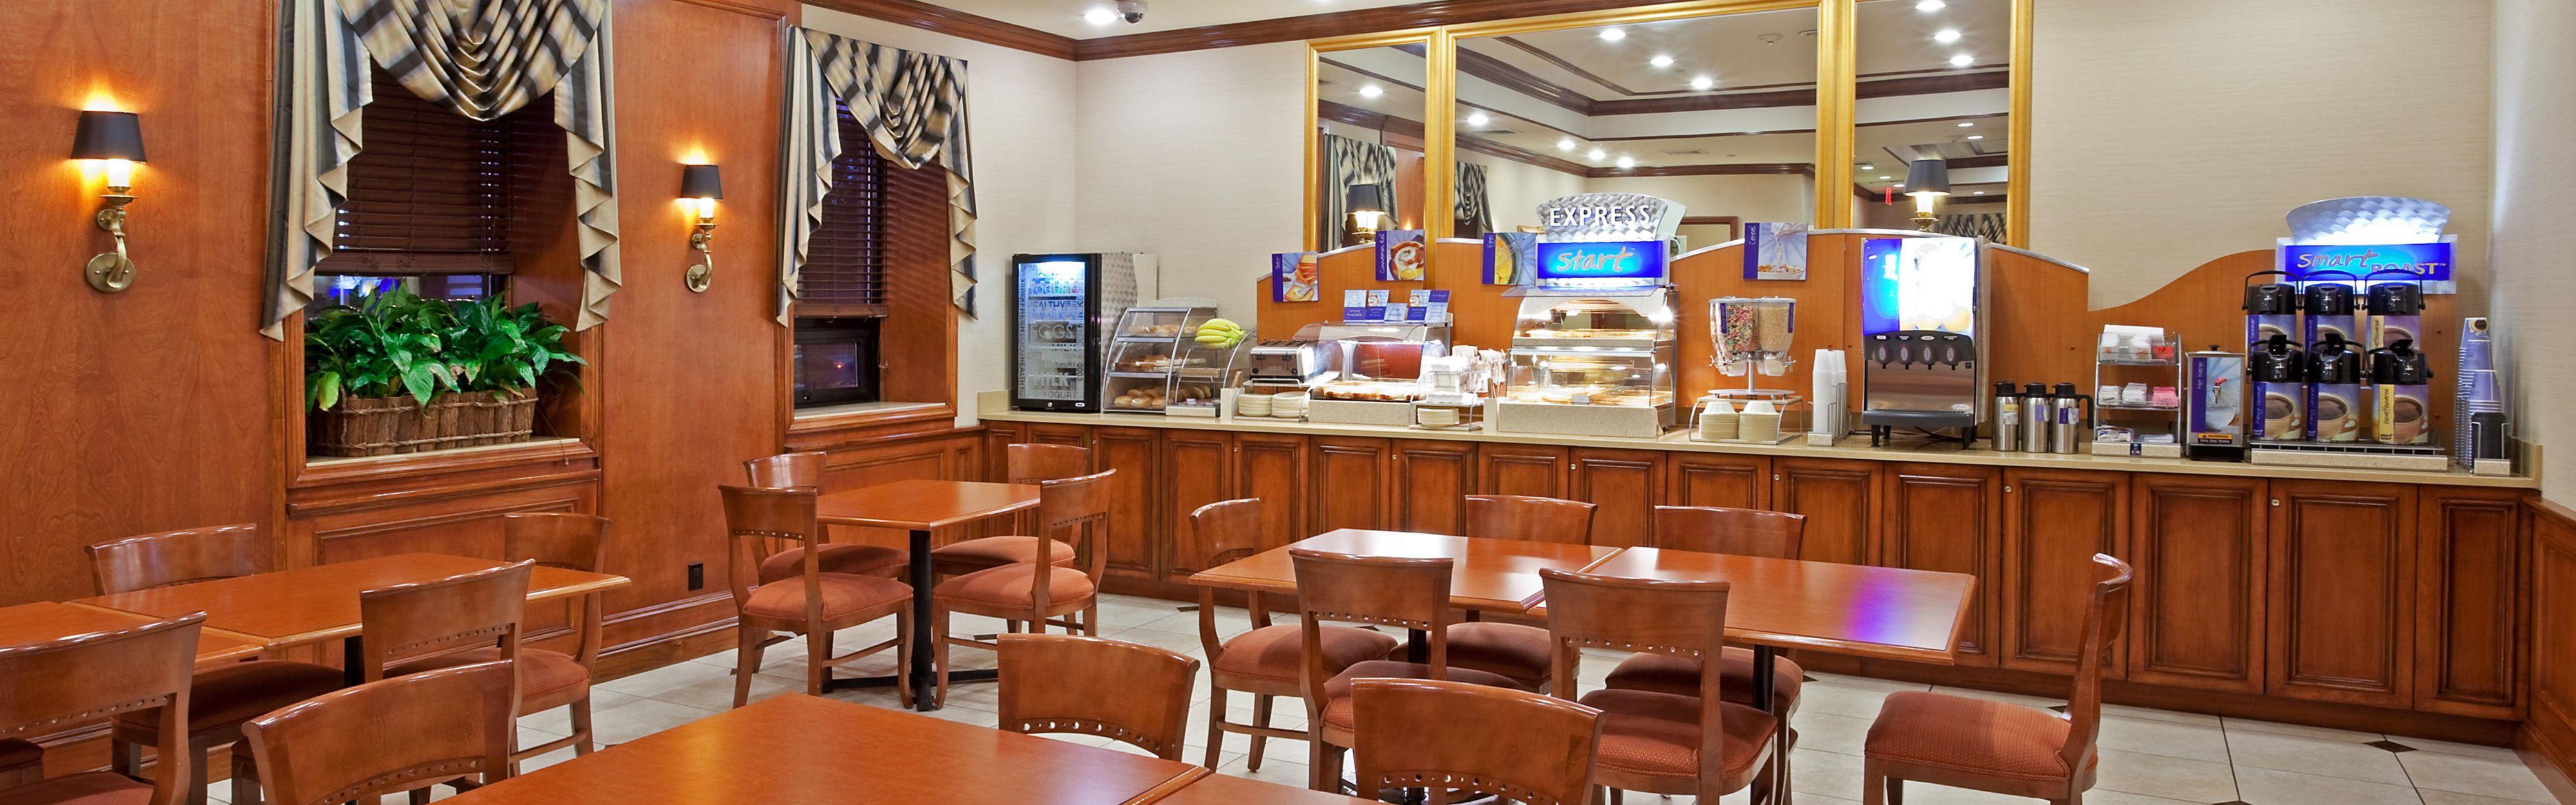 Holiday Inn Express Lynbrook - Rockville Centre image 3